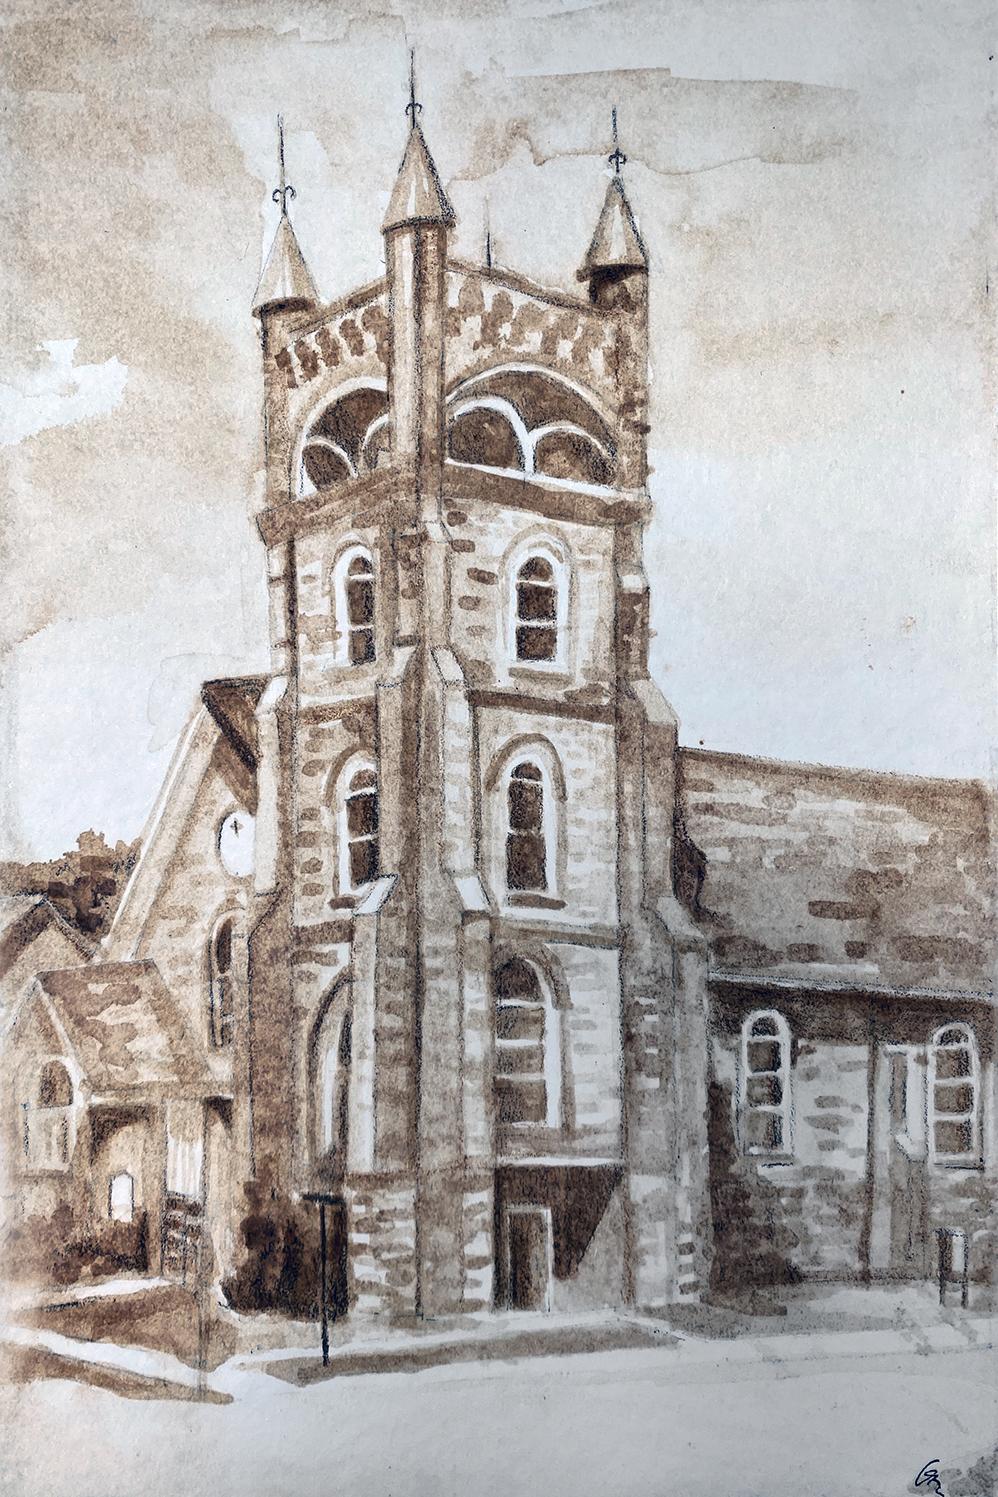 Tottenham United Church by Gwen Elmhirst, soy sauce on paper - Banting Memorial High School